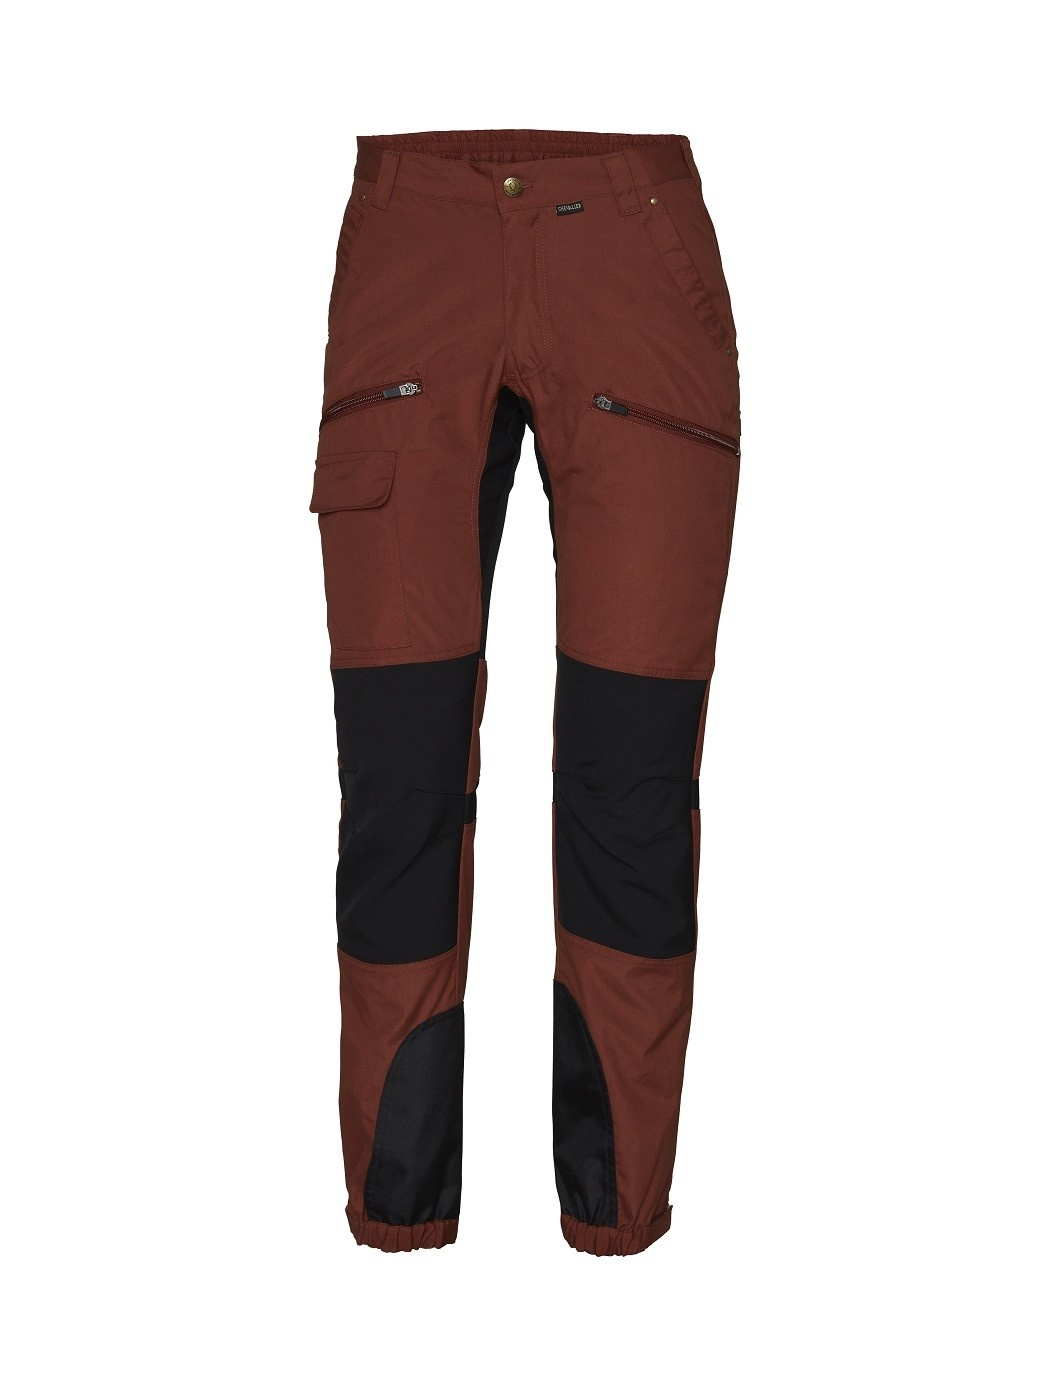 Chevalier Alabama Vent Pro Pant Women Orange Black-1